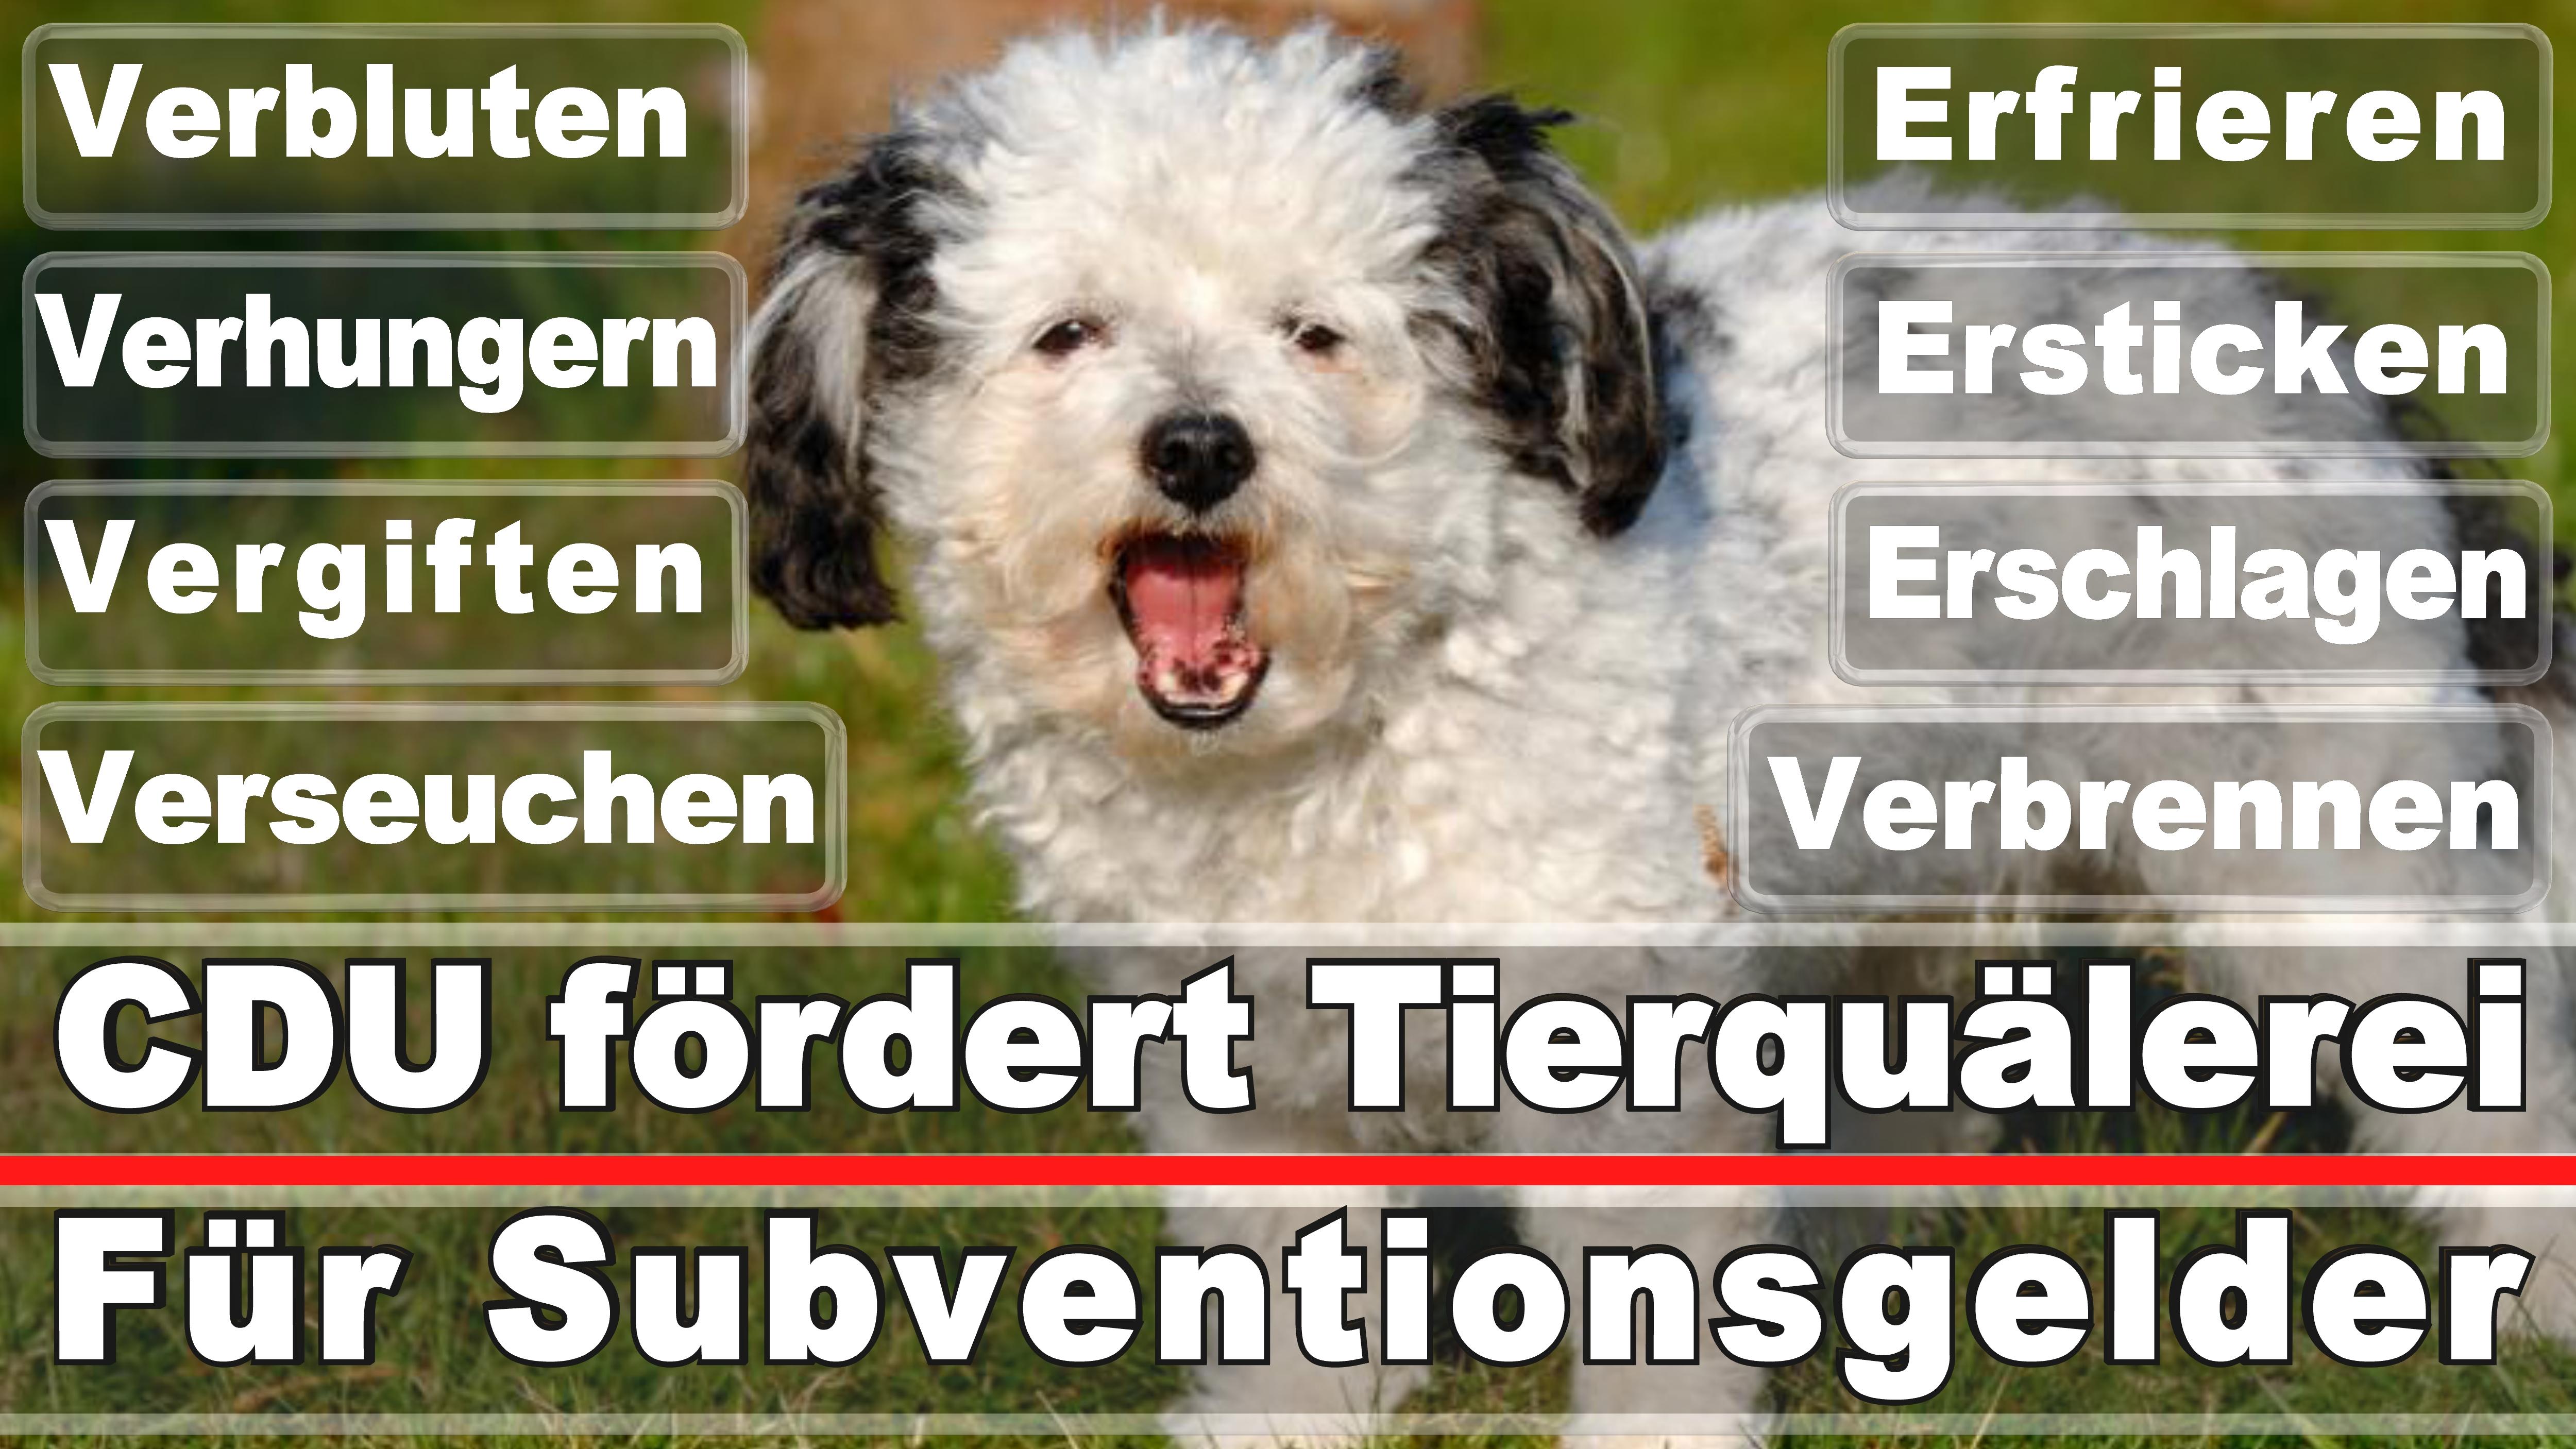 Landtagswahl-Bundestagswahl-CDU-SPD-FDP-AFD-Linke-Piraten-Tierschutzpartei (52)